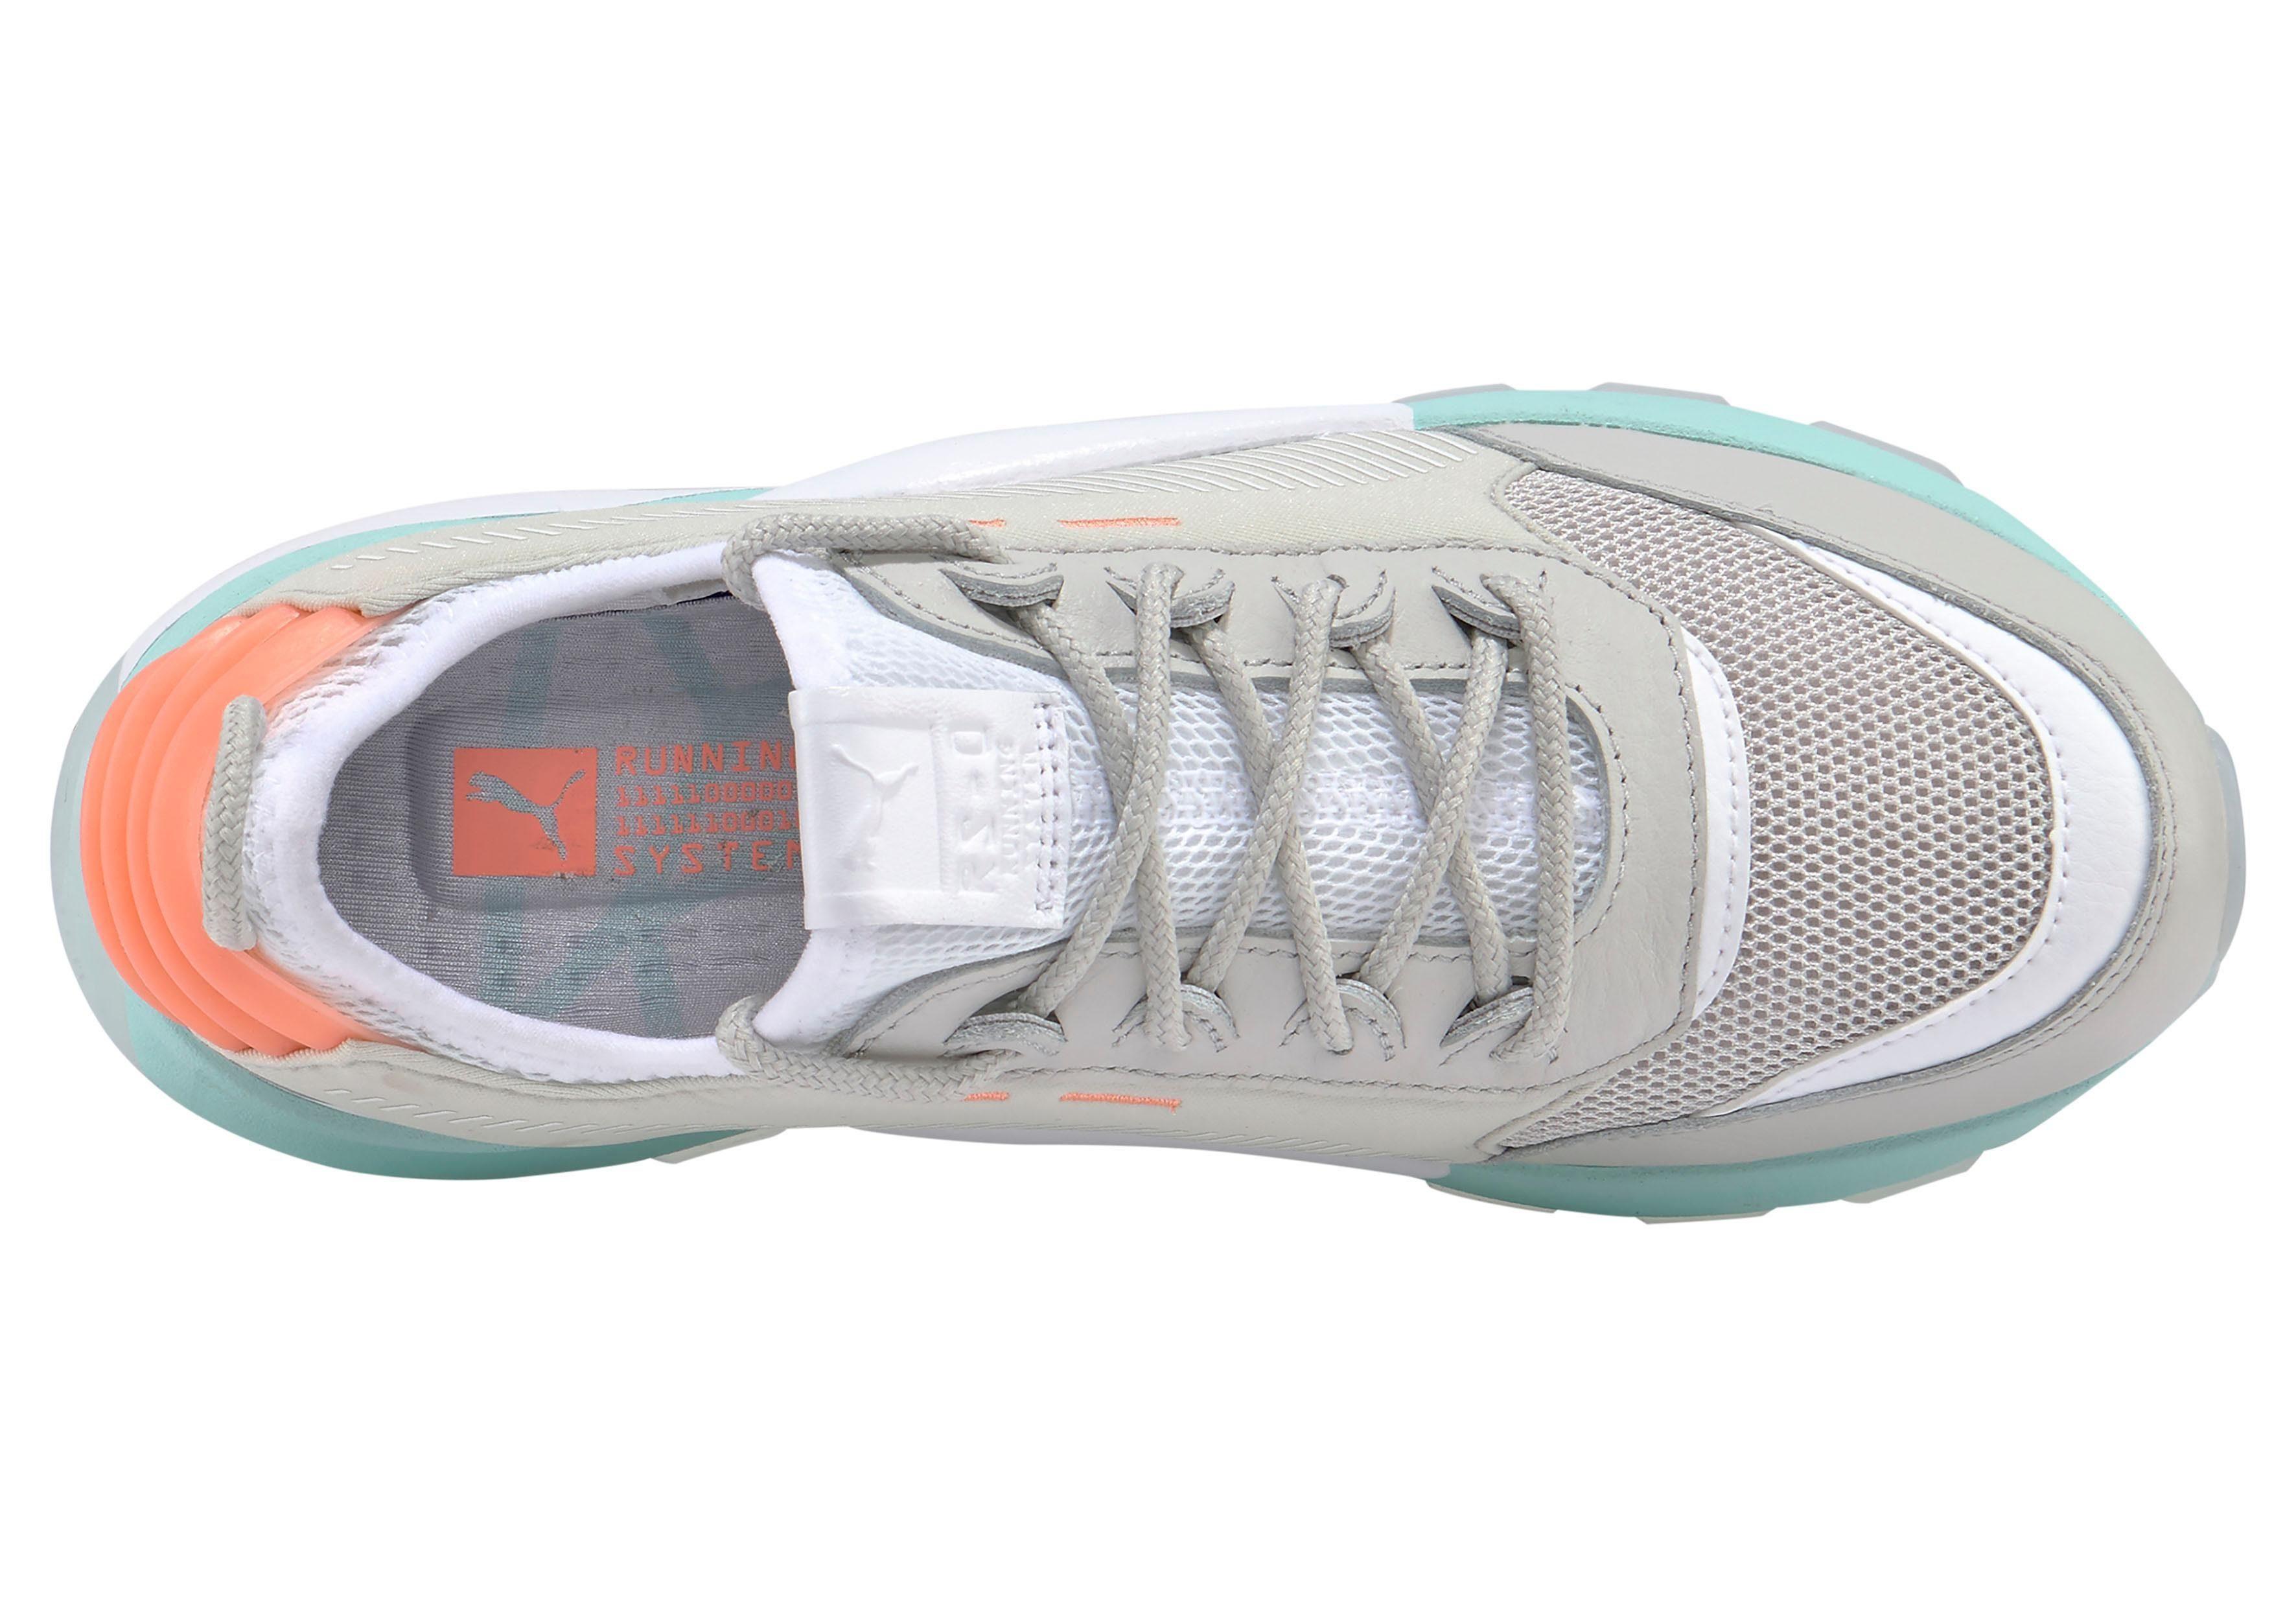 Puma RS 0 Tracks sneakers grijs | wehkamp